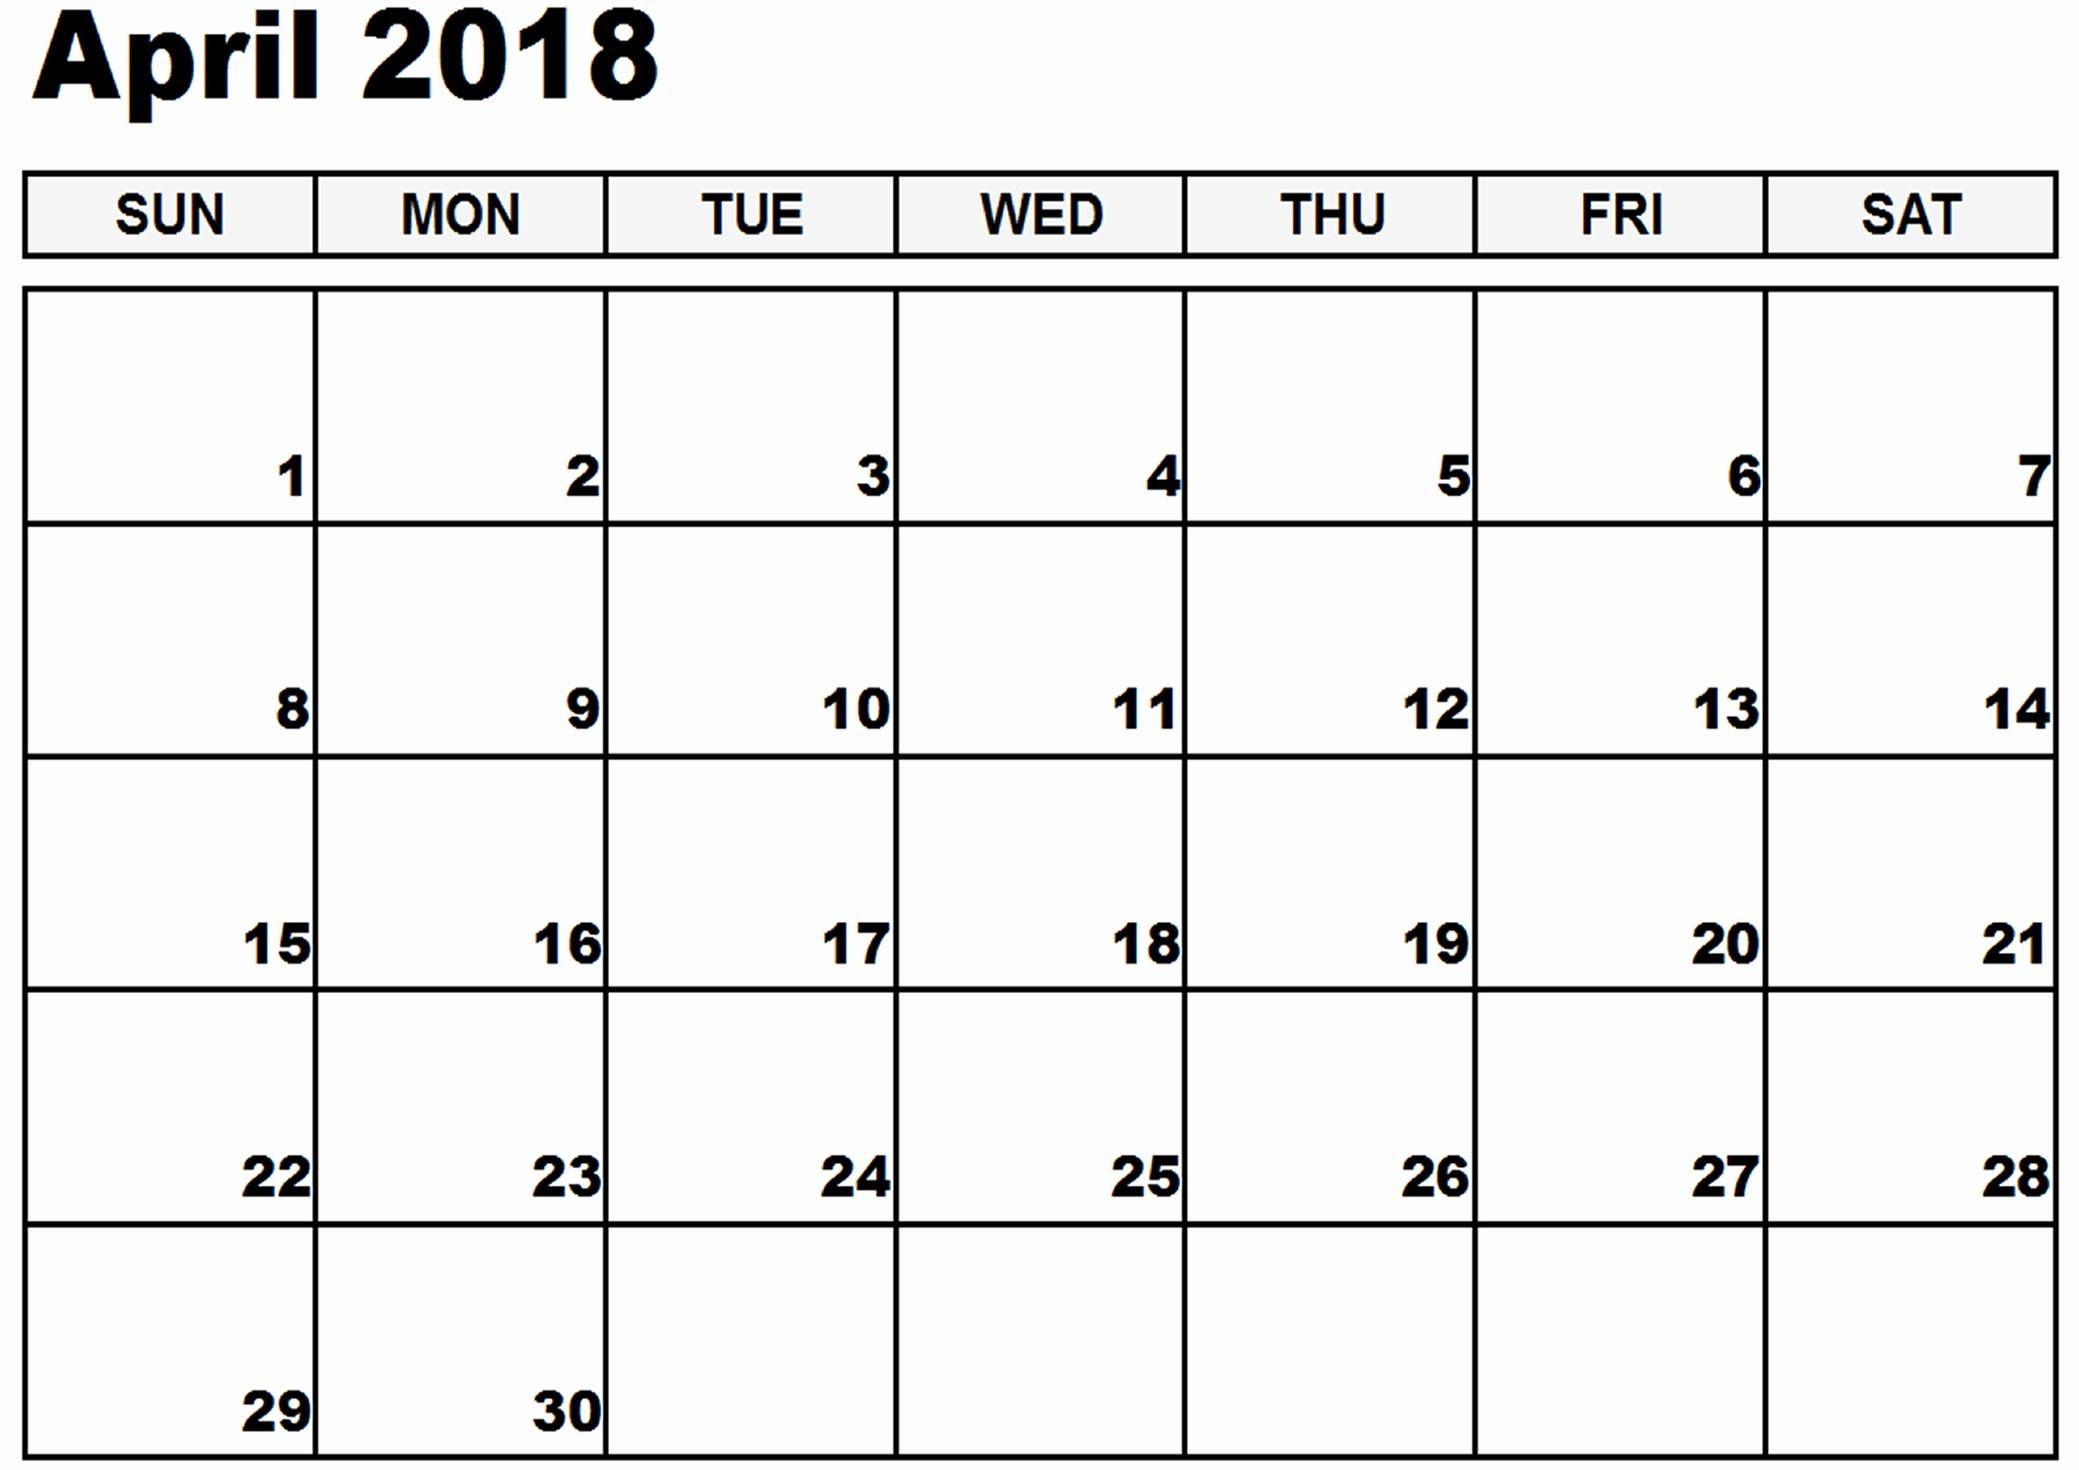 Blank April 2018 Calendar Template Lovely April 2018 Calendar Printable [free]